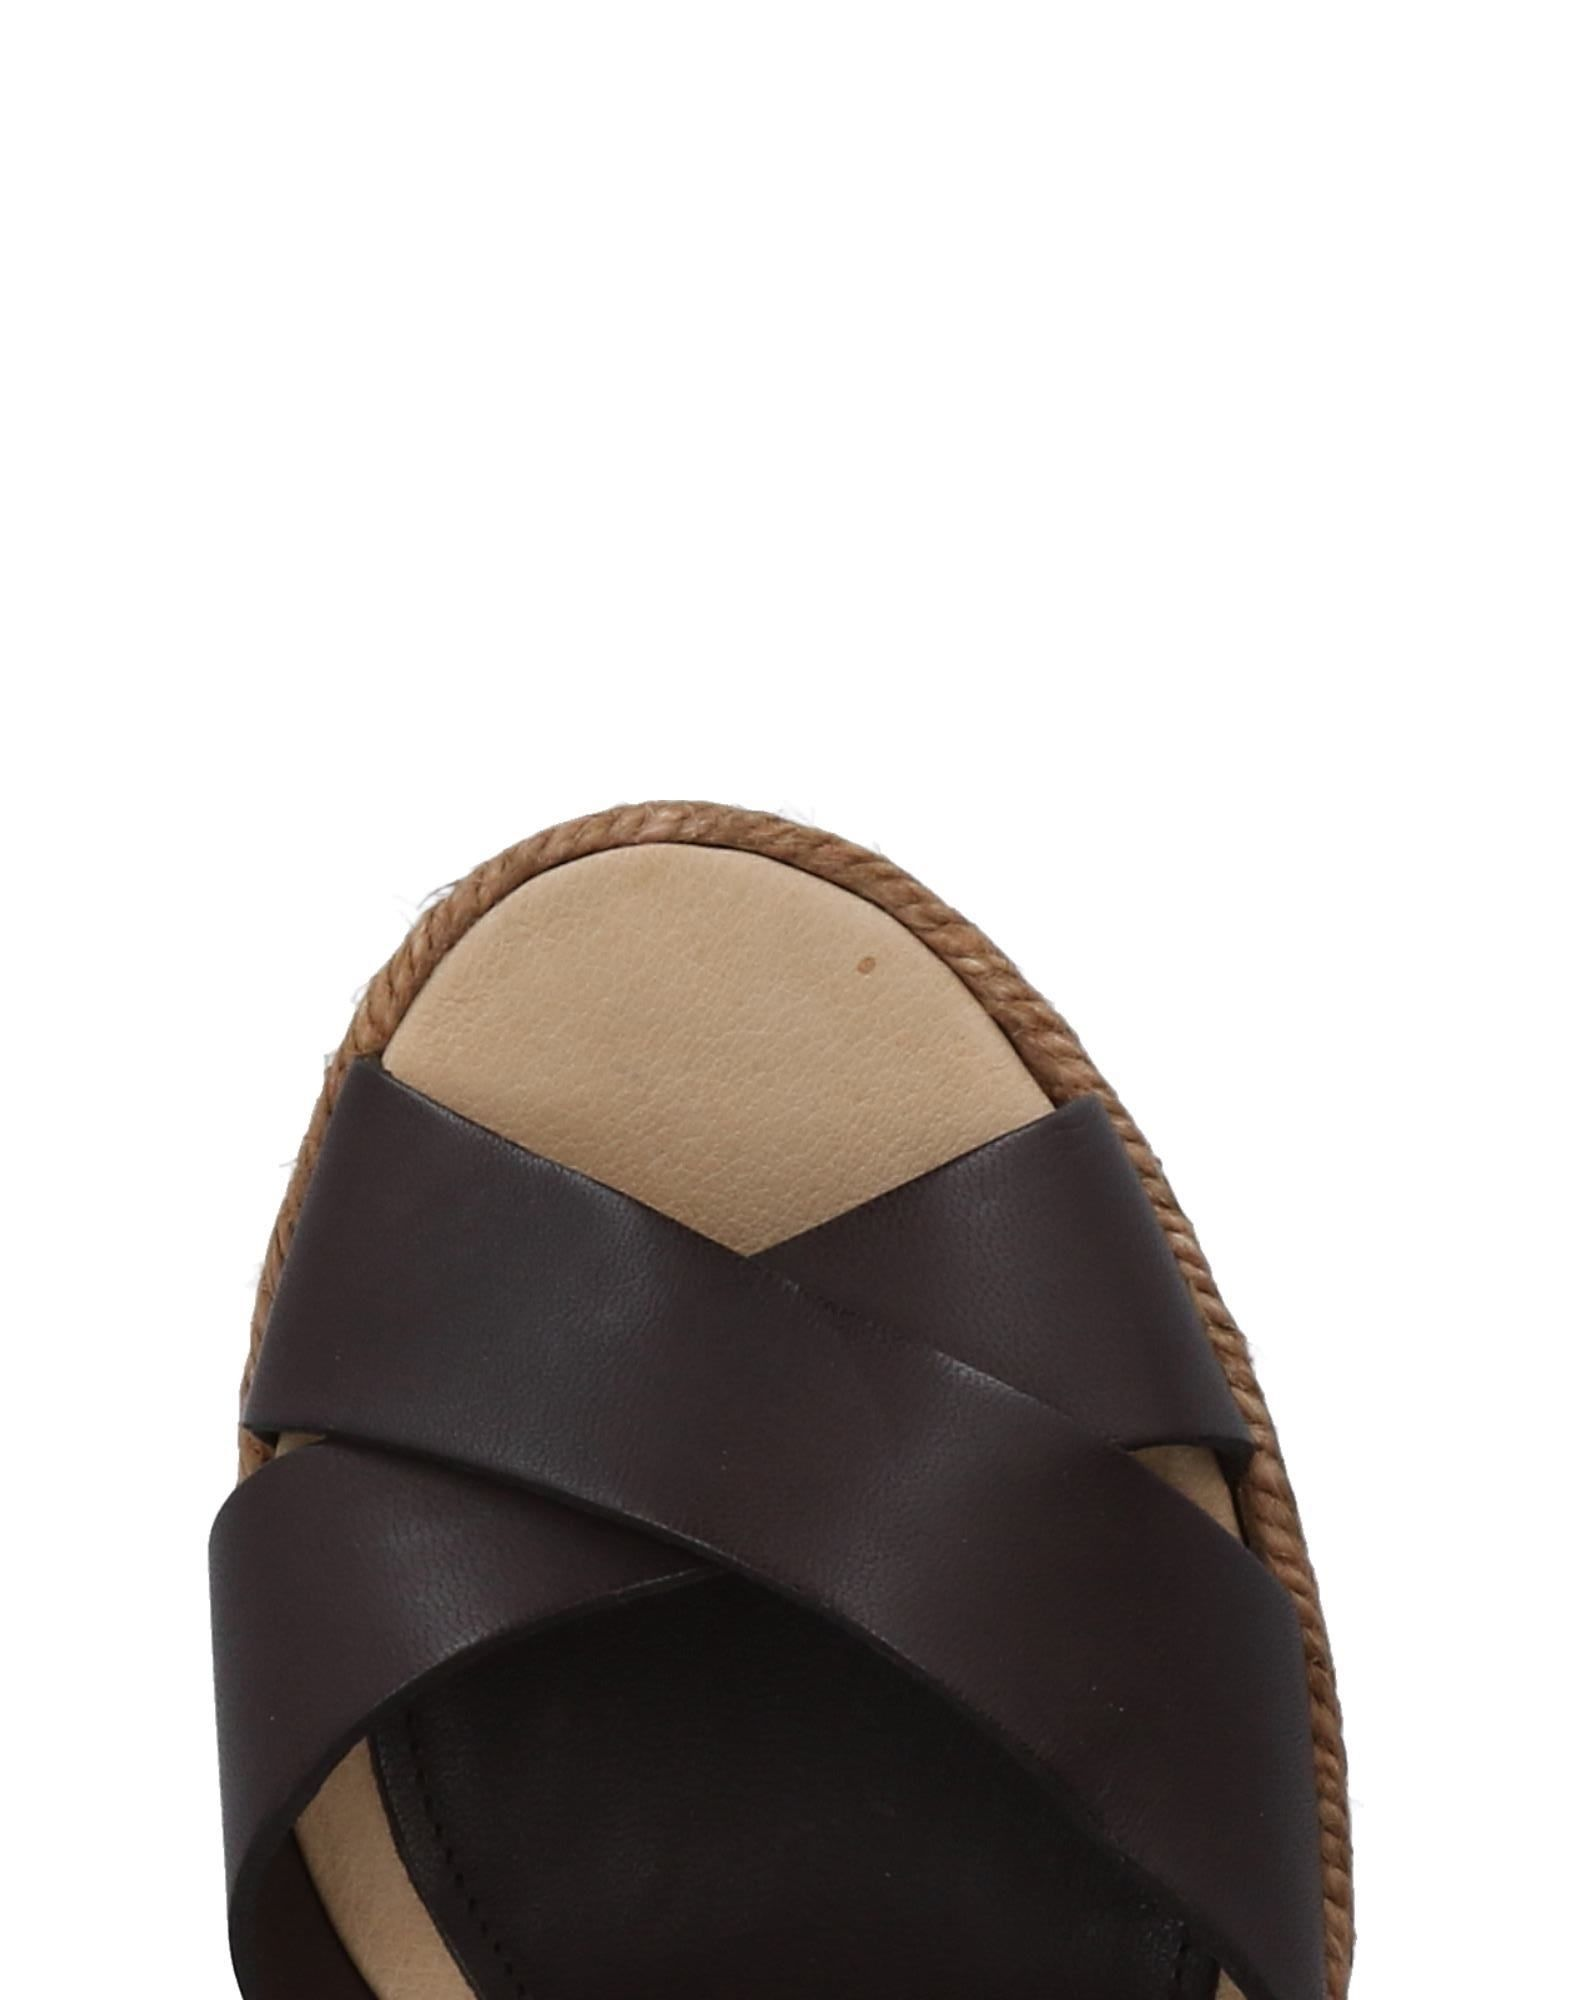 Palomitas By Paloma Barceló Espadrilles Damen  11172896BF Gute Qualität beliebte Schuhe